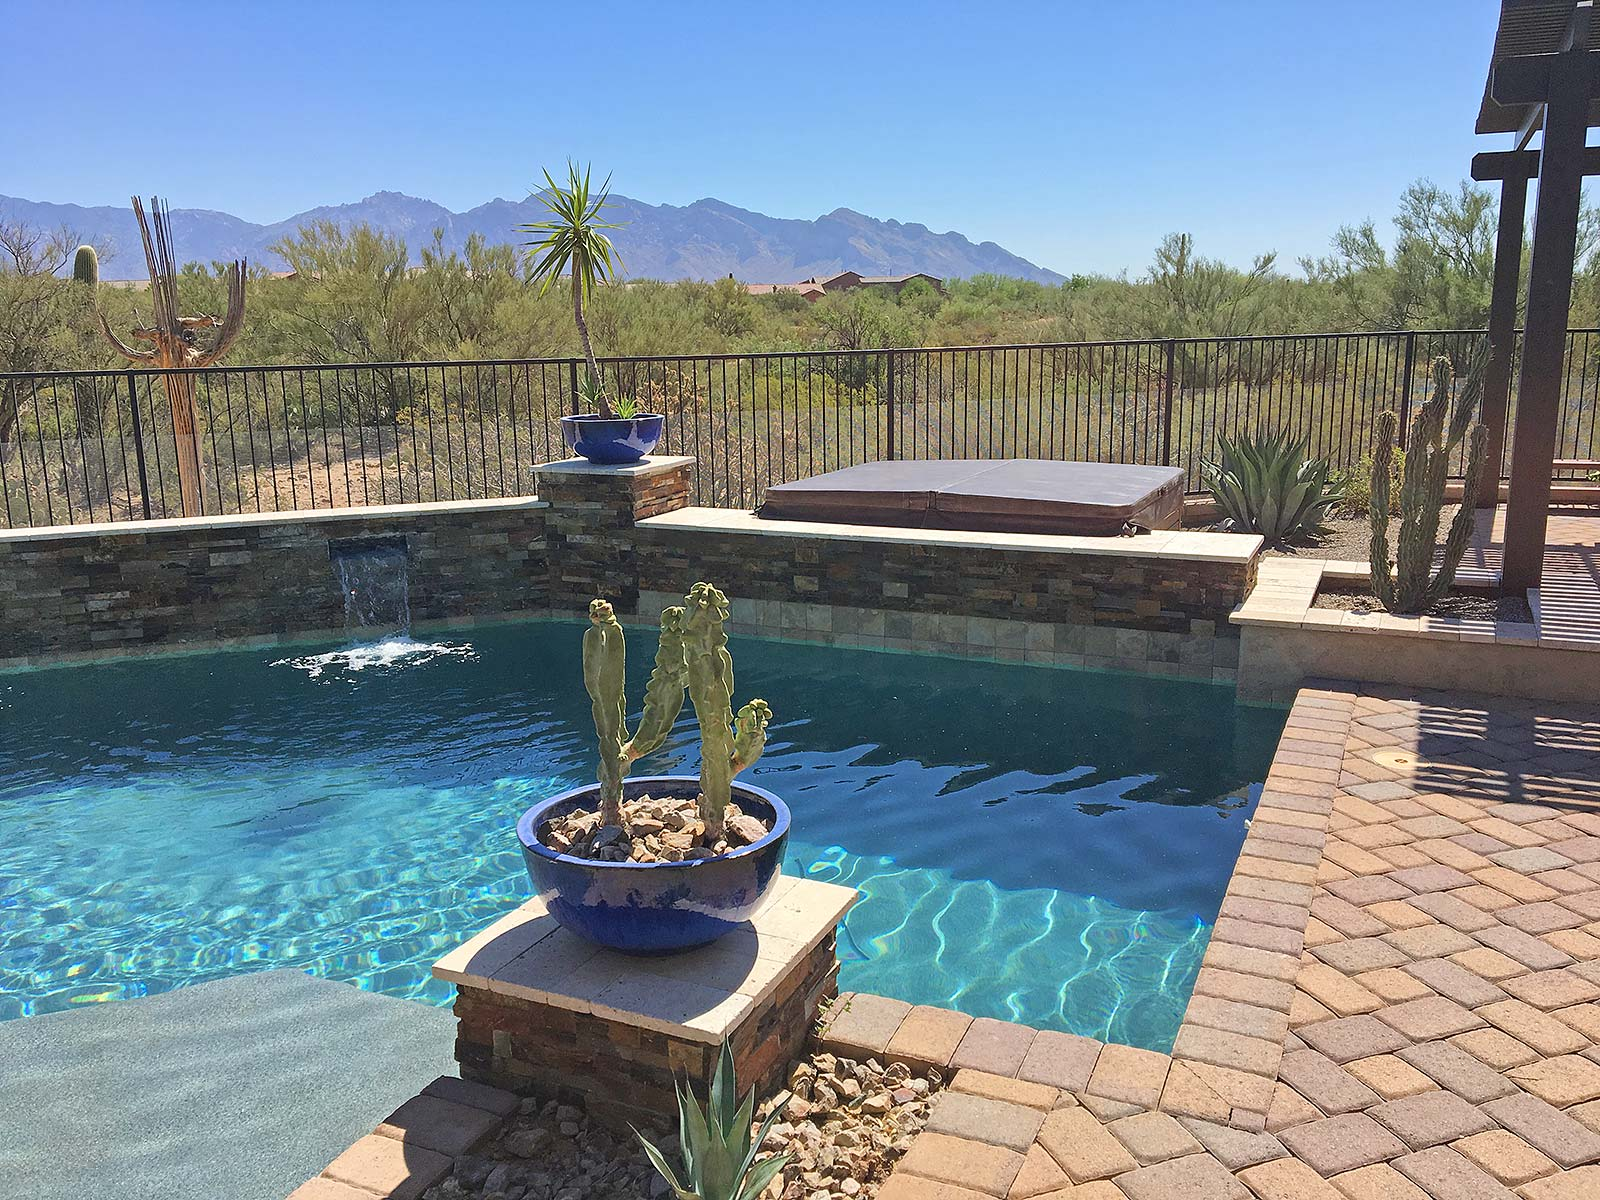 swimming pool contractor tucson arizona